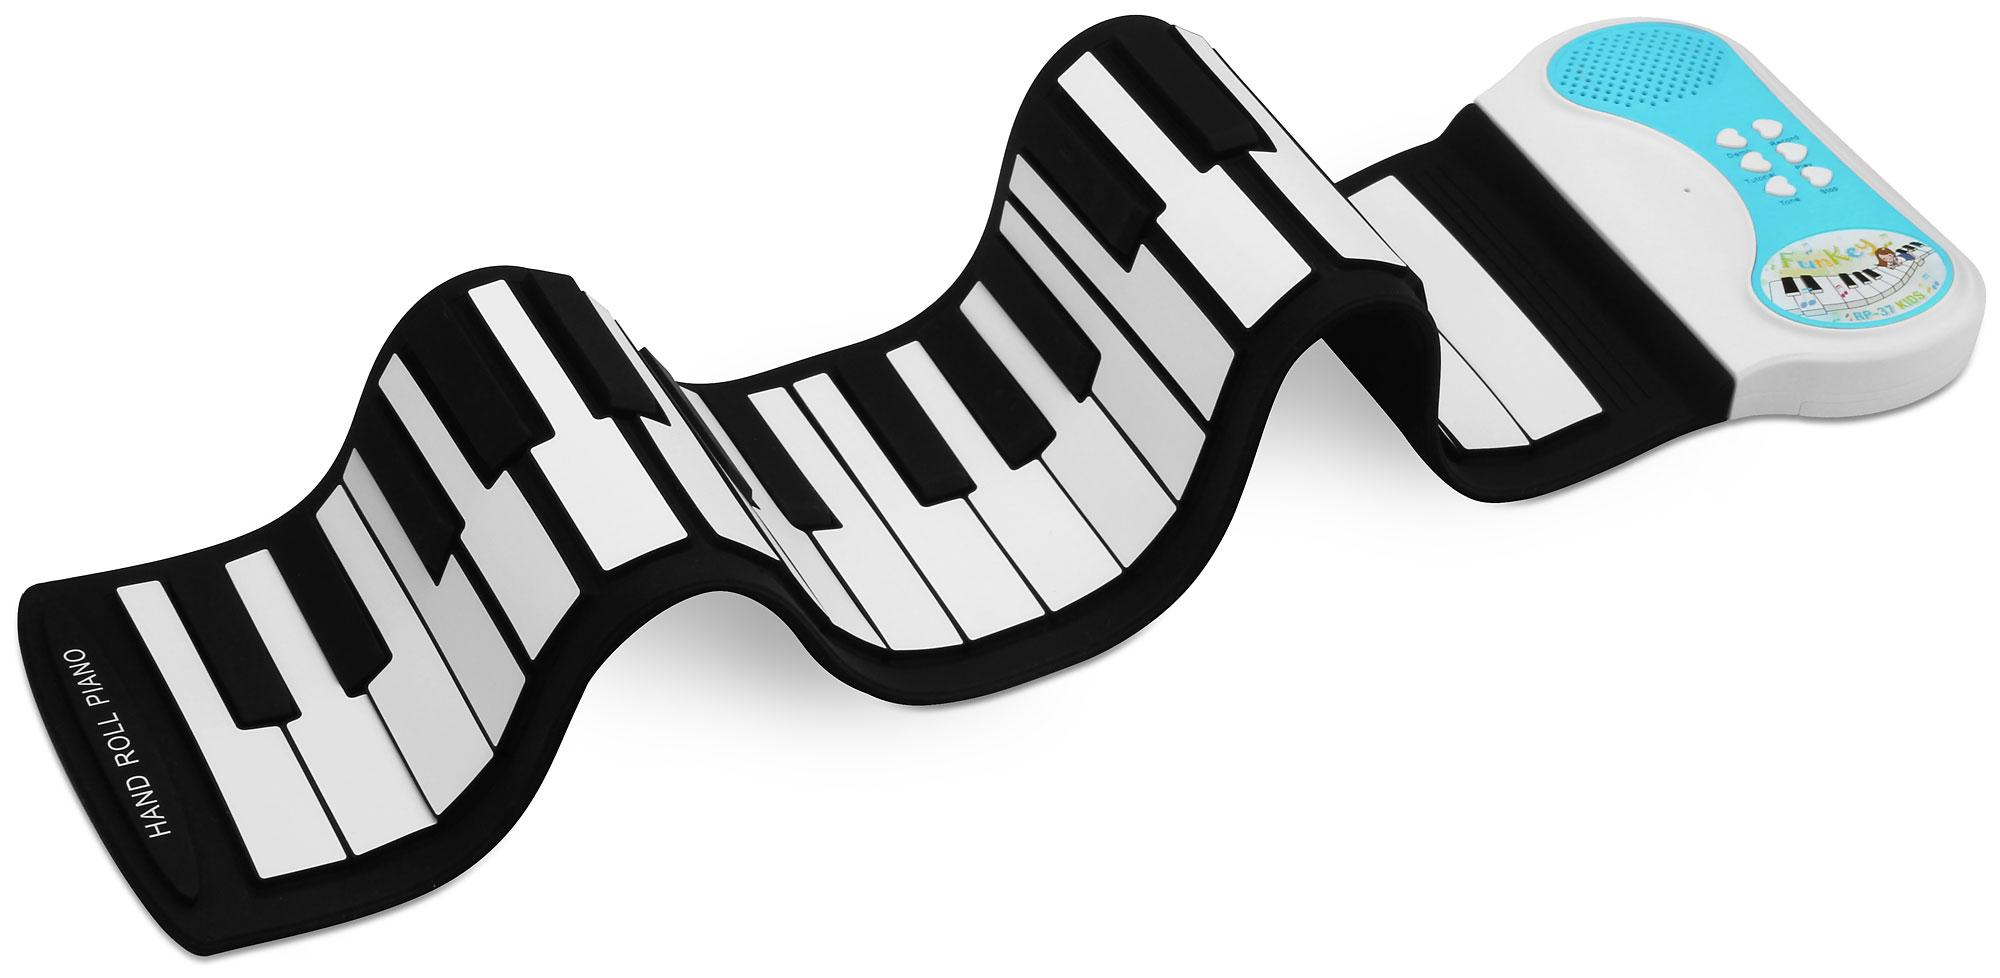 Funkey Rp 37 Kids Roll Up Piano